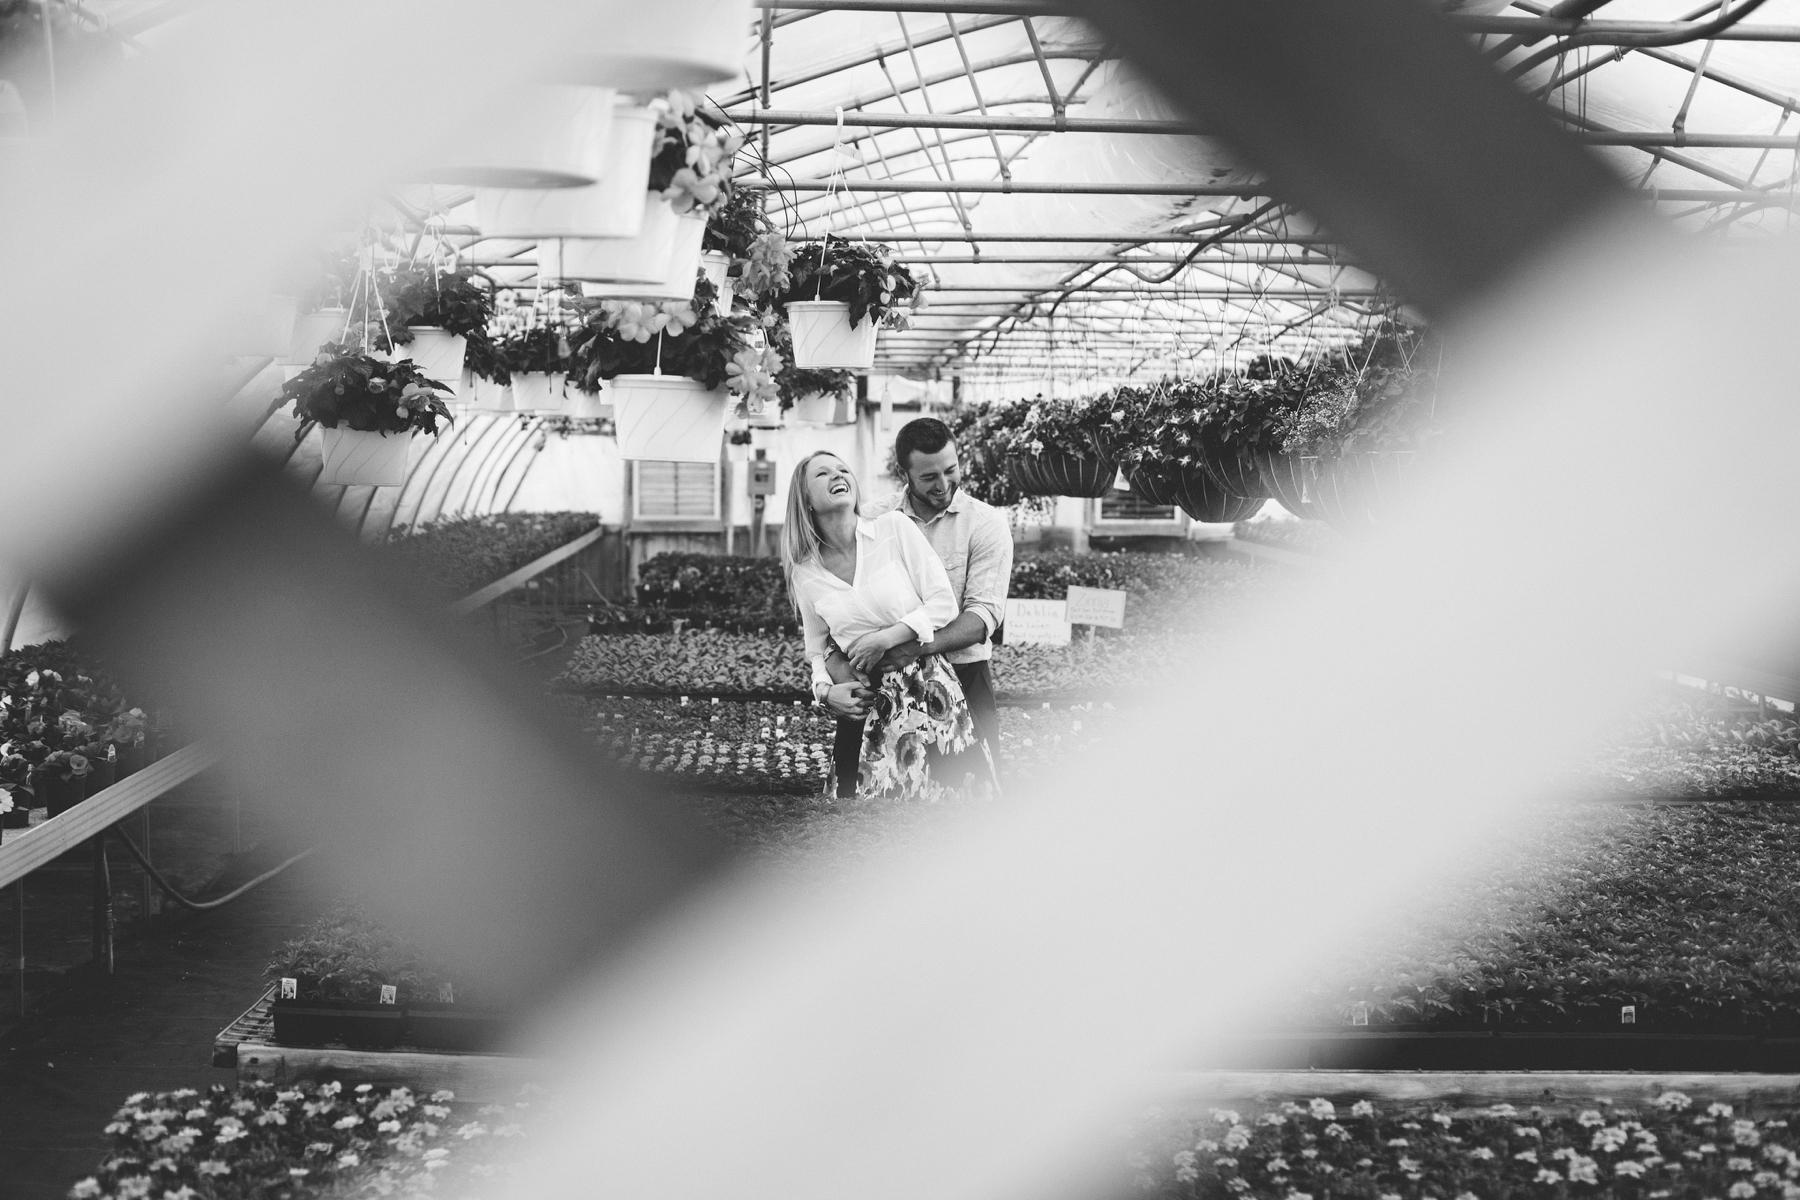 Brandon_Shafer_Photography_Shane_Ashley_Greenhouse_Farm_Michigan_Engagement_0002.jpg